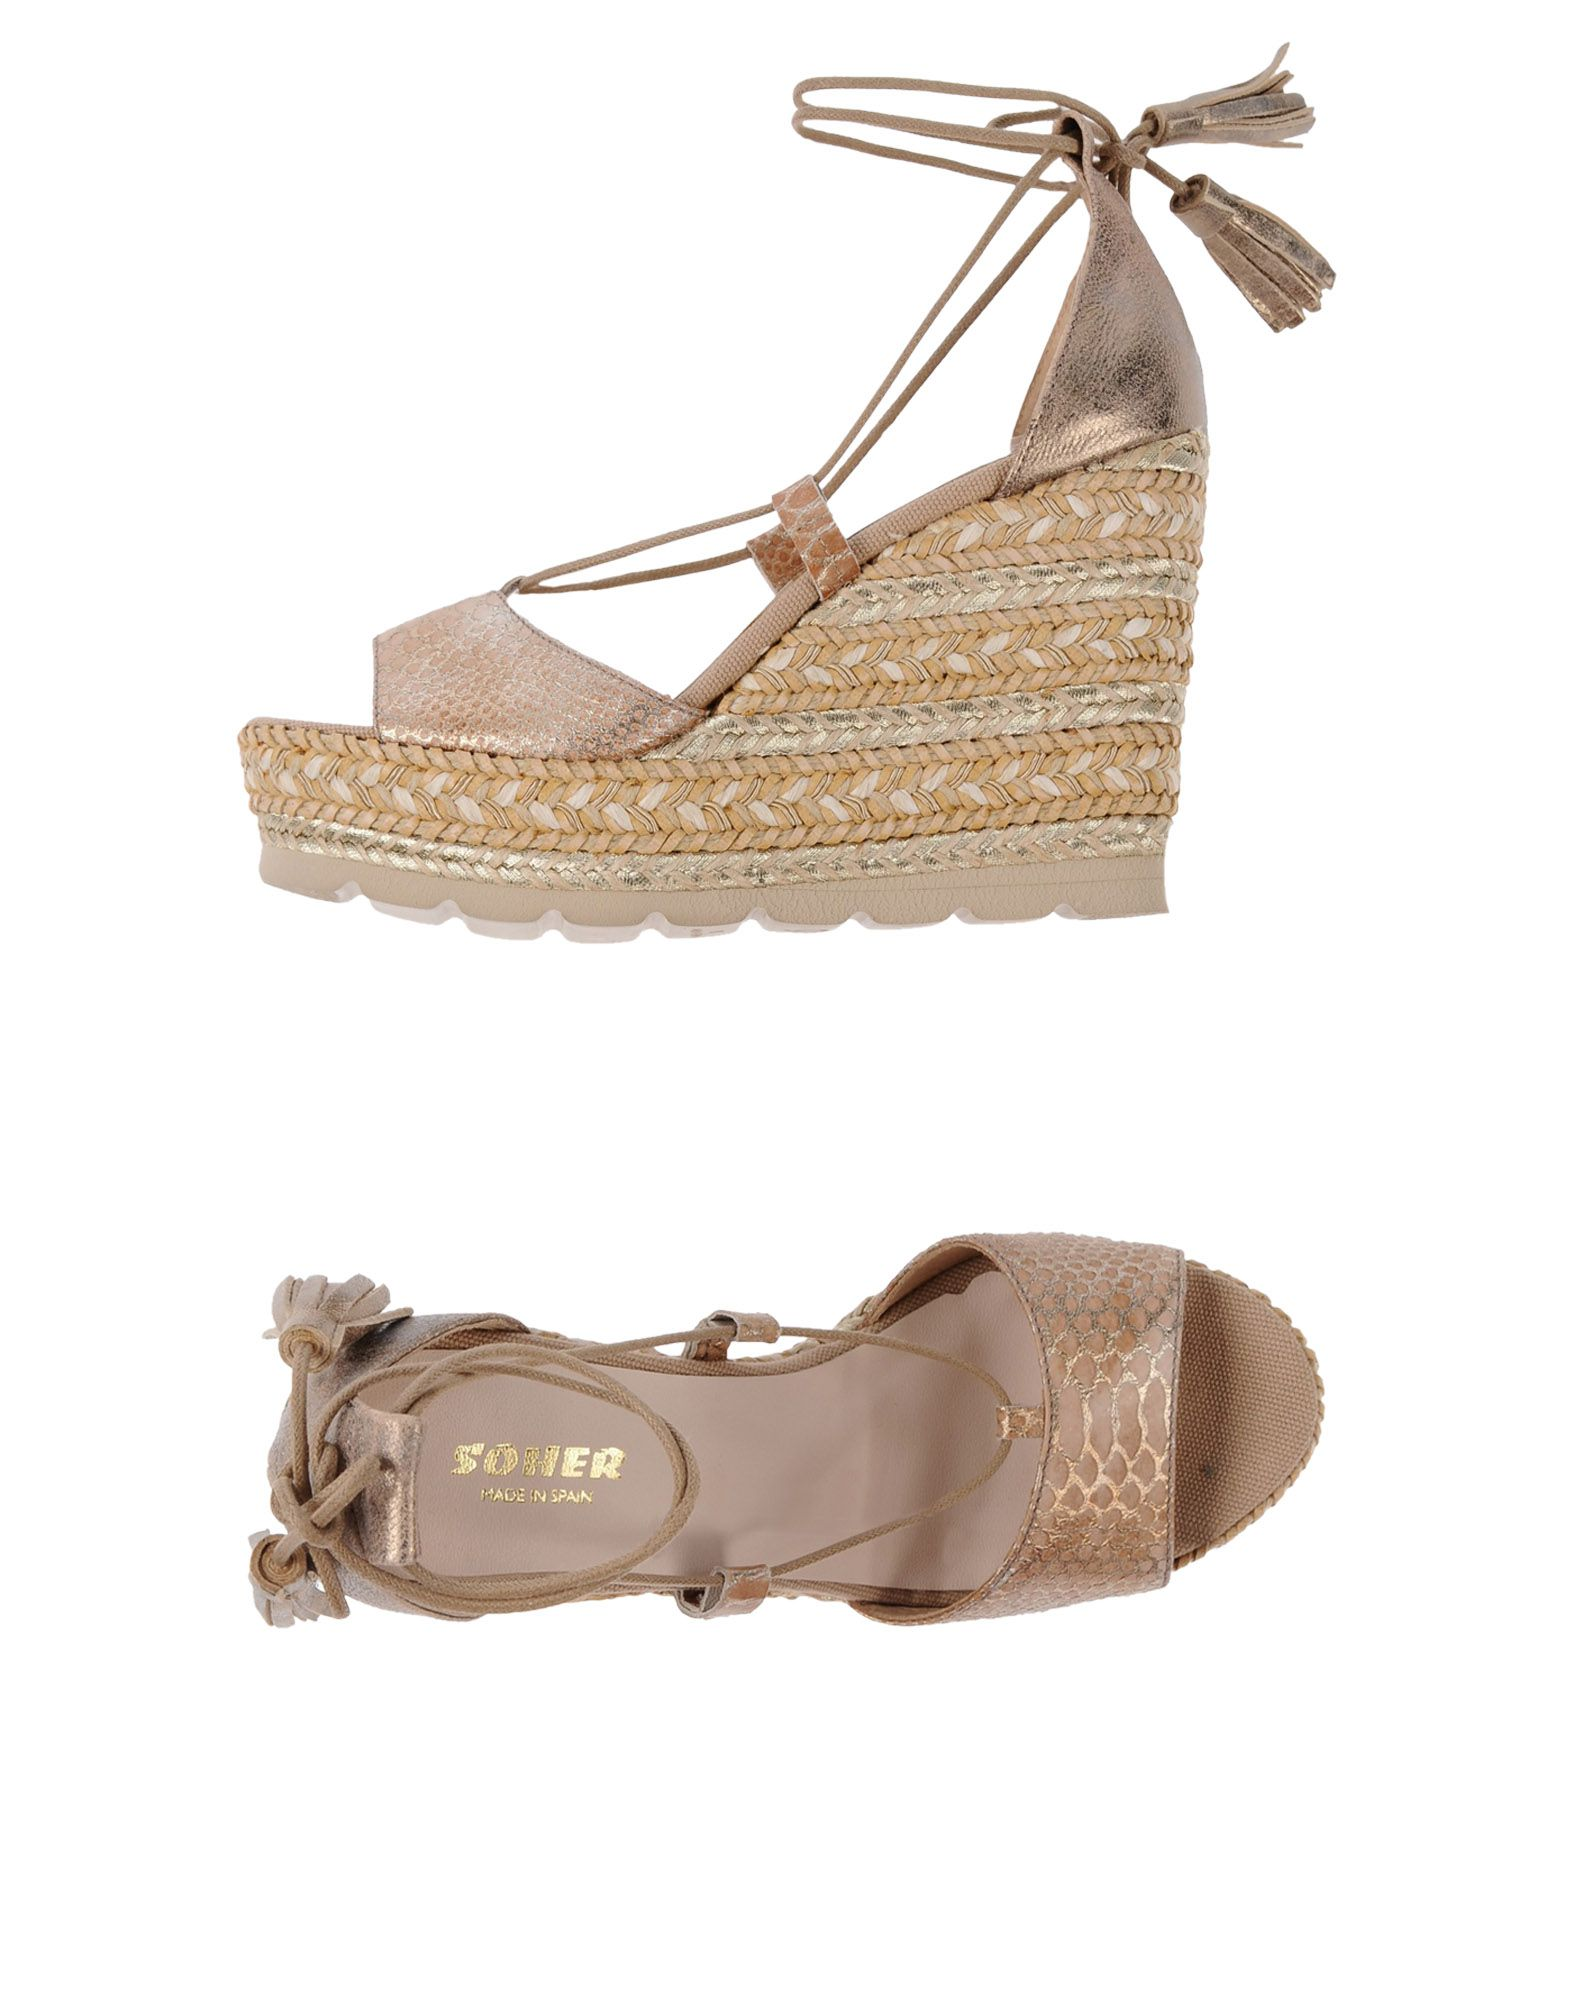 Soher Sandalen Damen  11460548SB Gute Qualität beliebte Schuhe